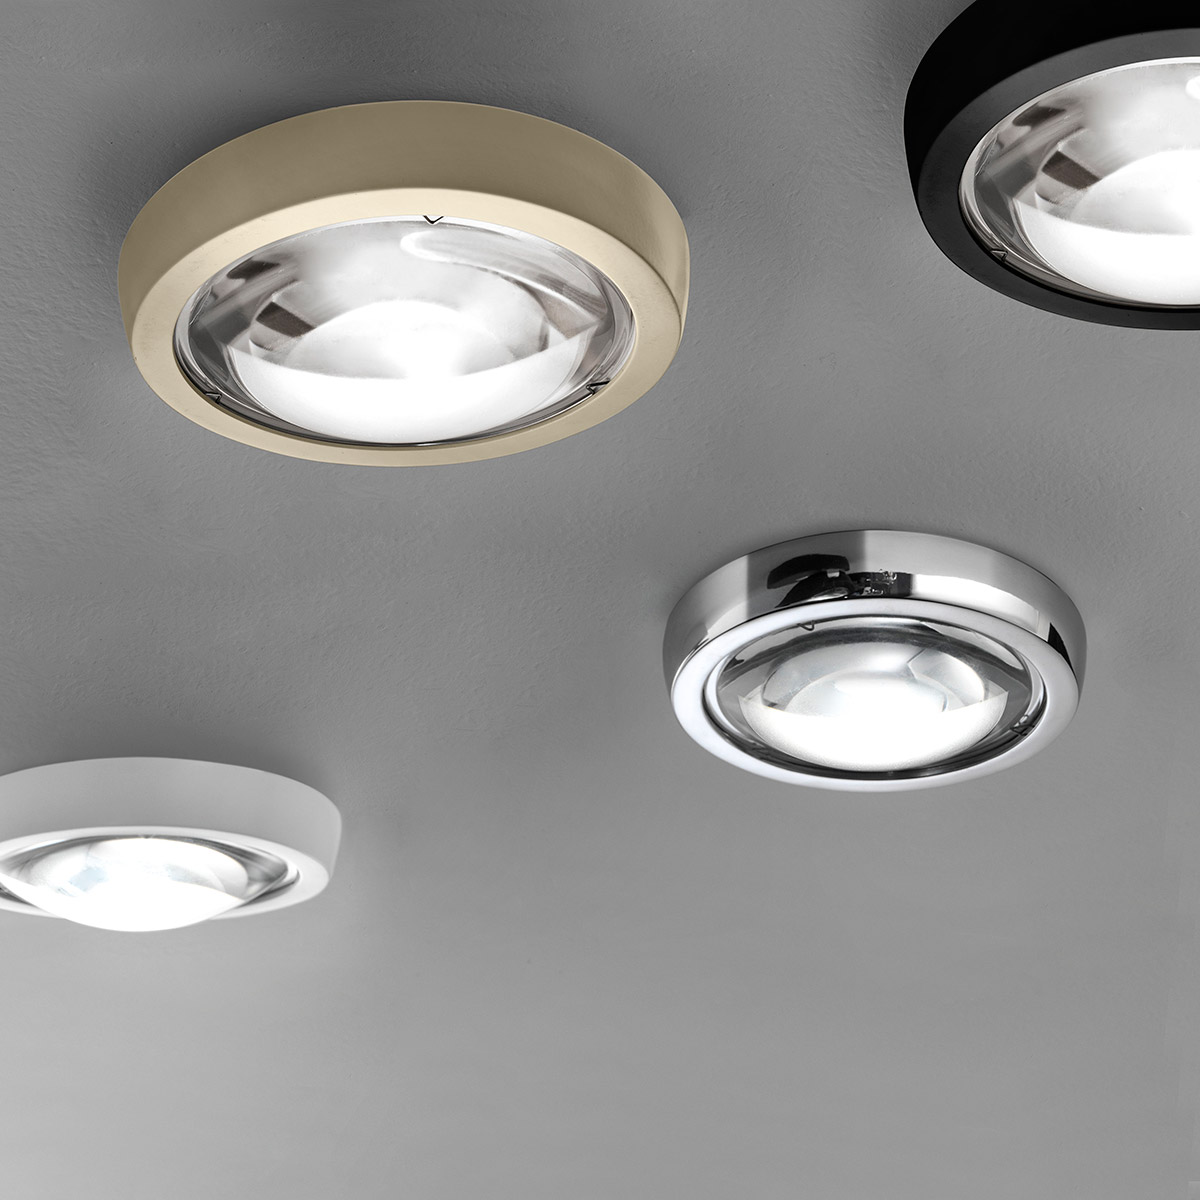 Studio Italia Design Nautilus Spot 3000 K LED Deckenaufbauleuchte